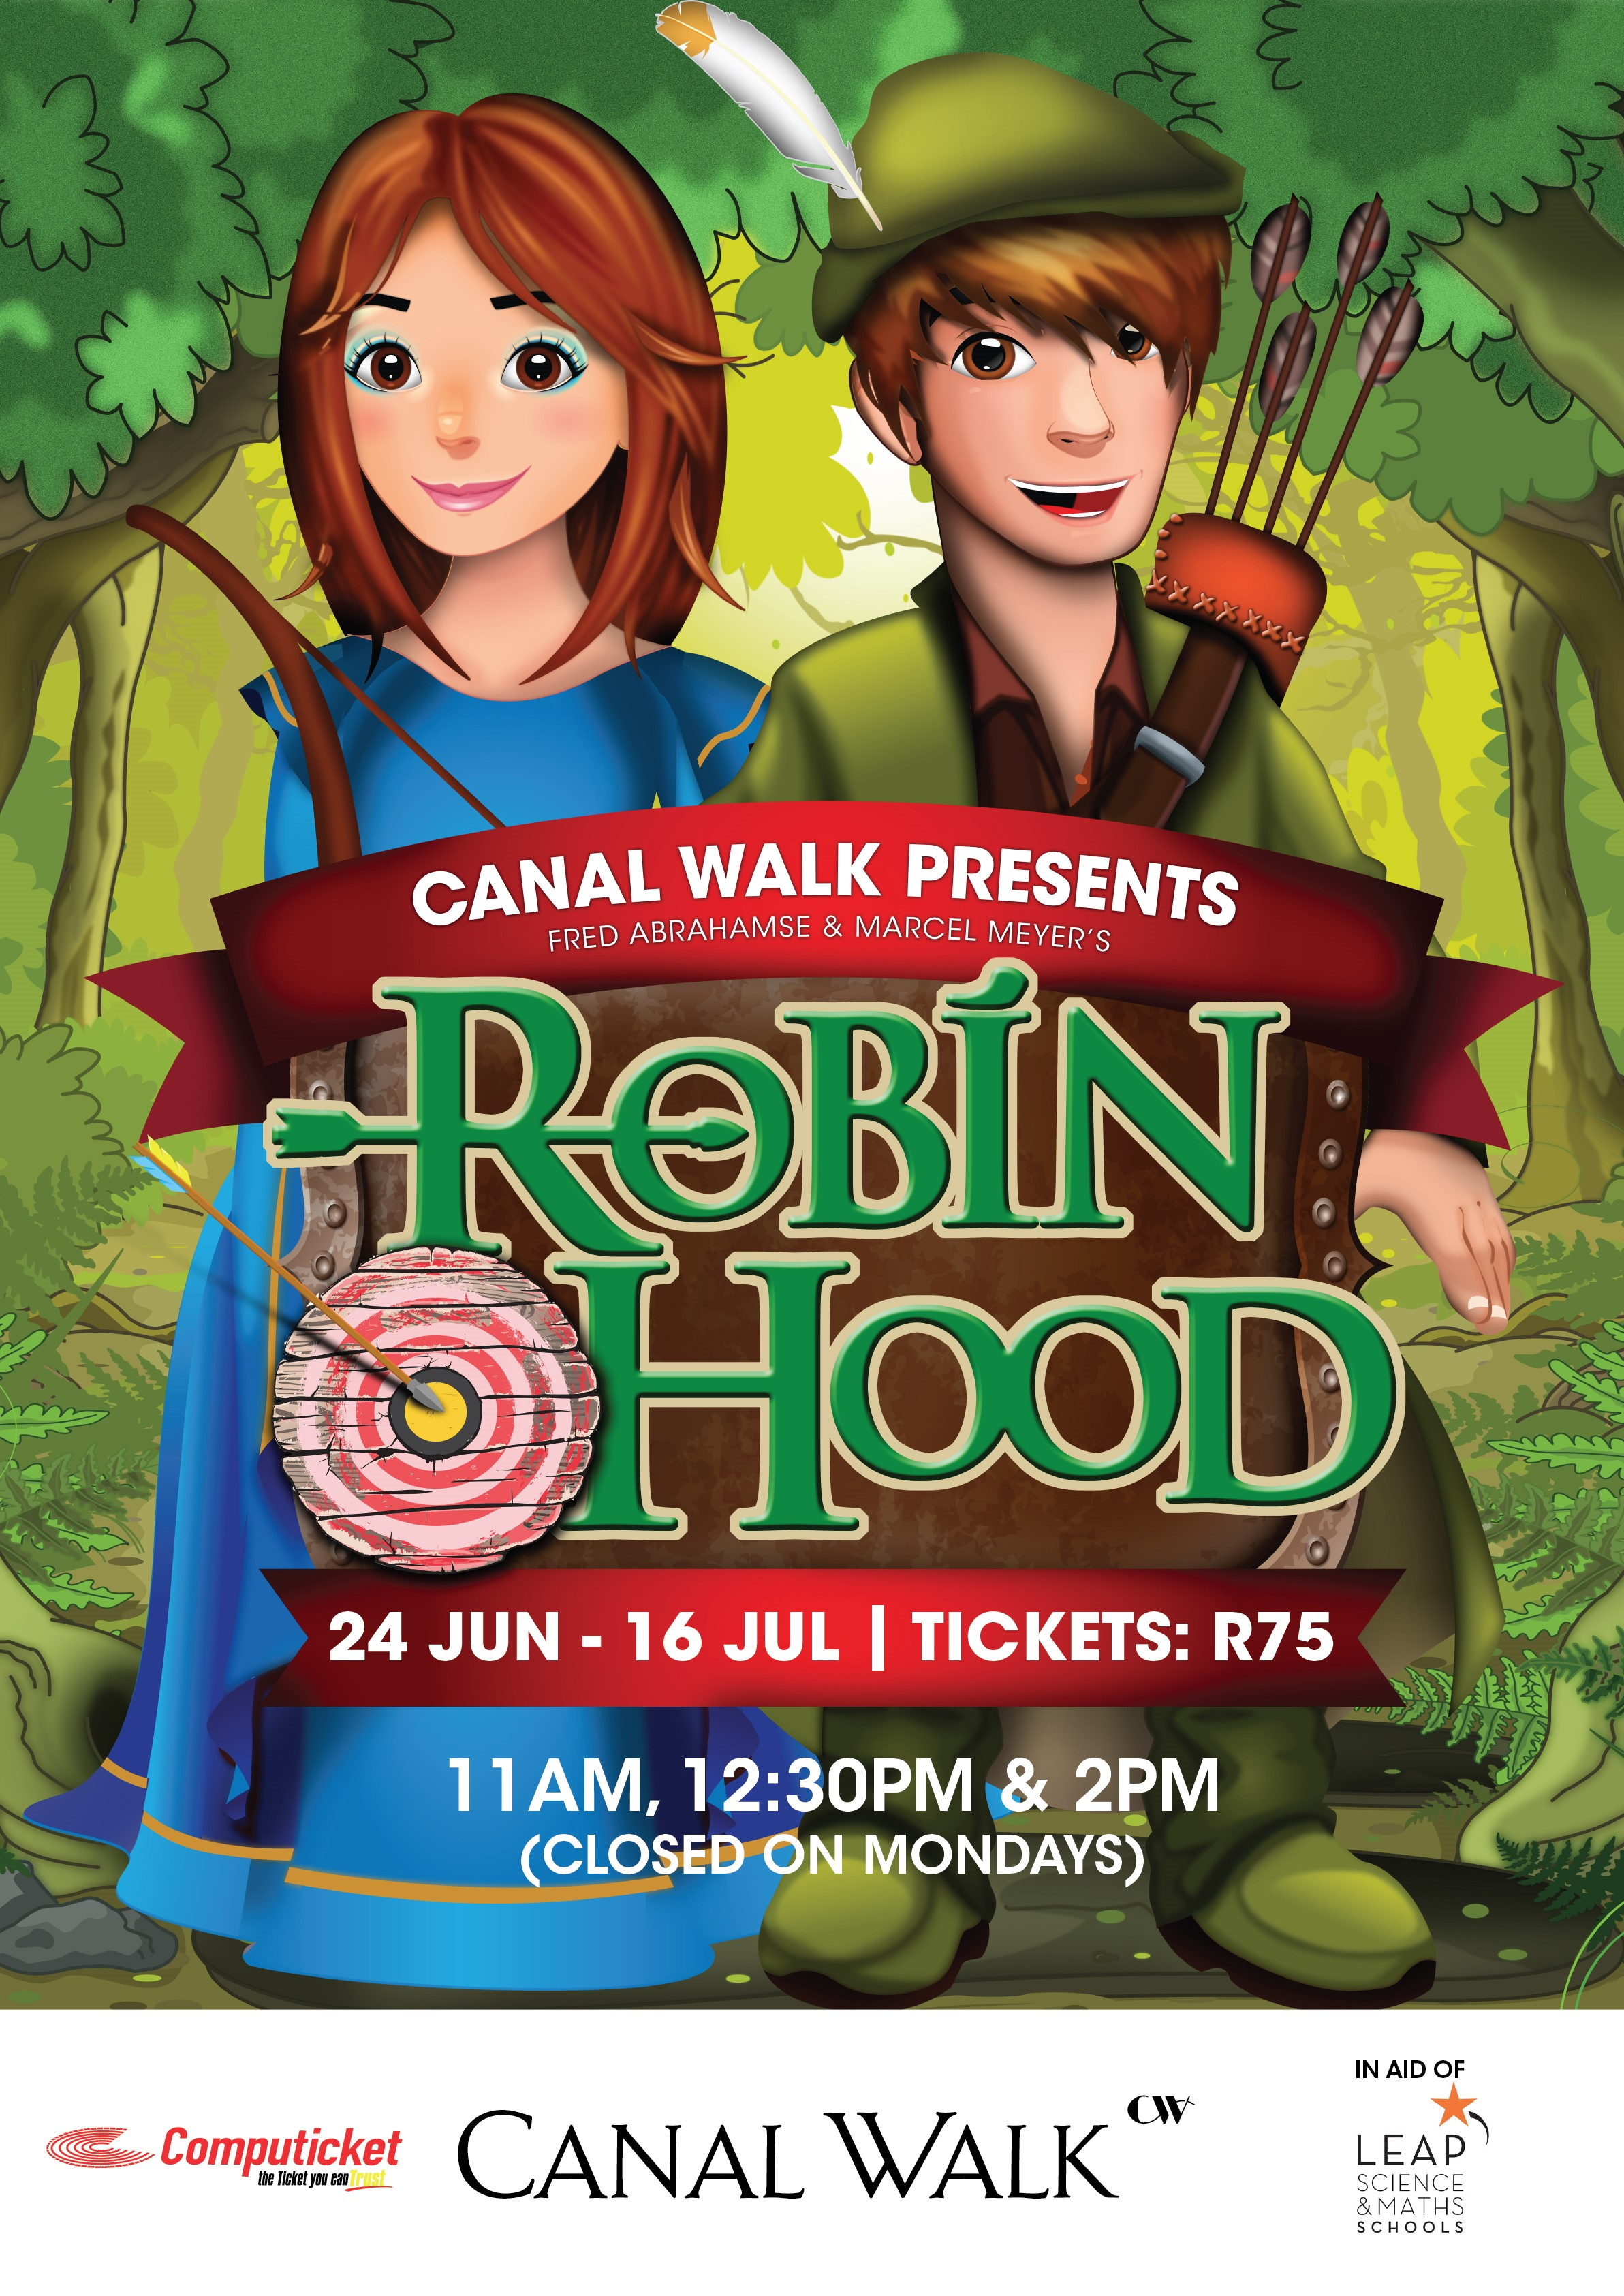 Canal Walk Robin Hood